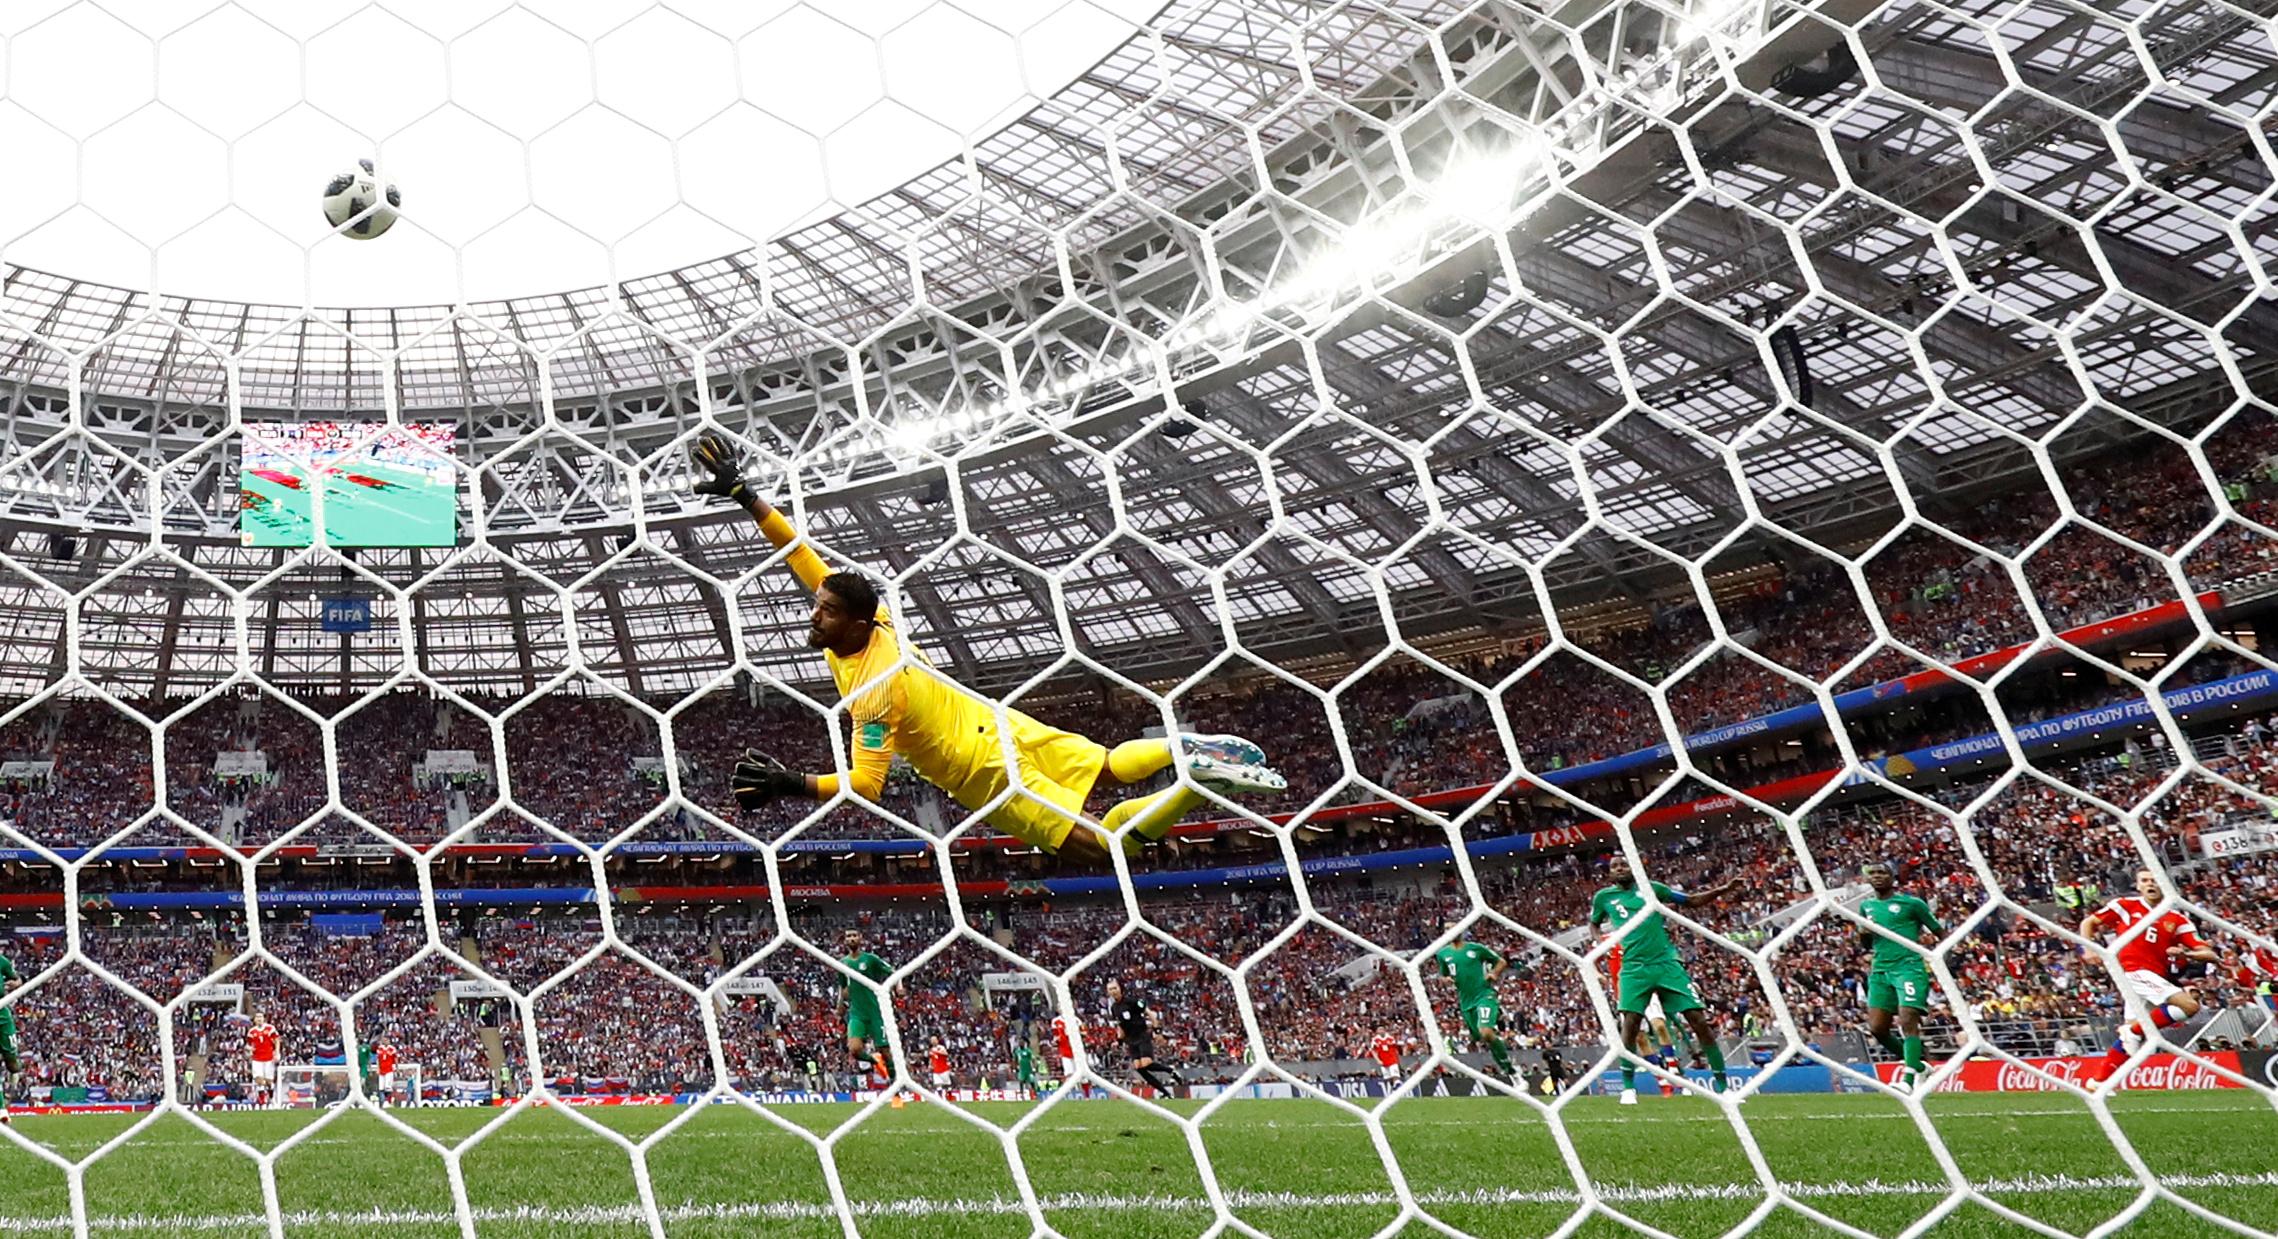 Soccer Football - World Cup - Group A - Russia vs Saudi Arabia - Luzhniki Stadium, Moscow, Russia - June 14, 2018  Russia's Denis Cheryshev scores their fourth goal